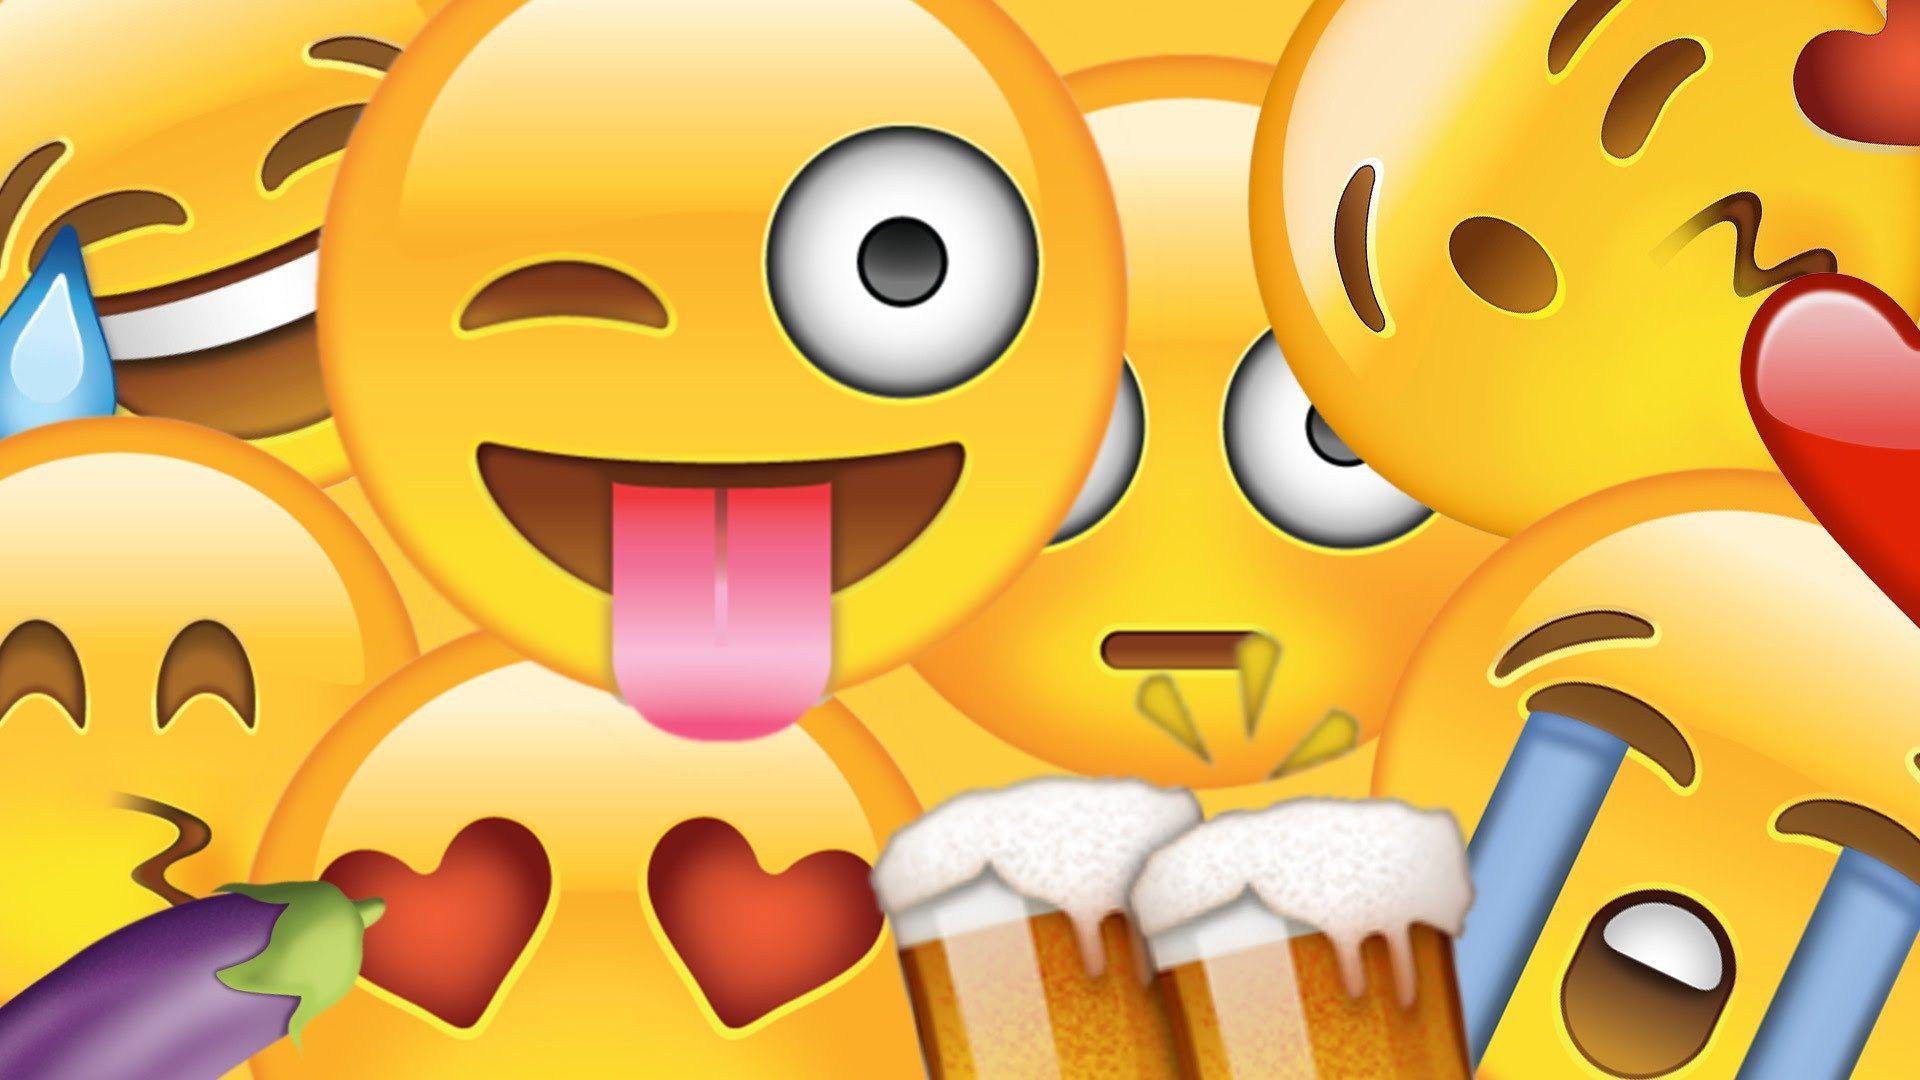 Emoji Wallpapers 1920x1080